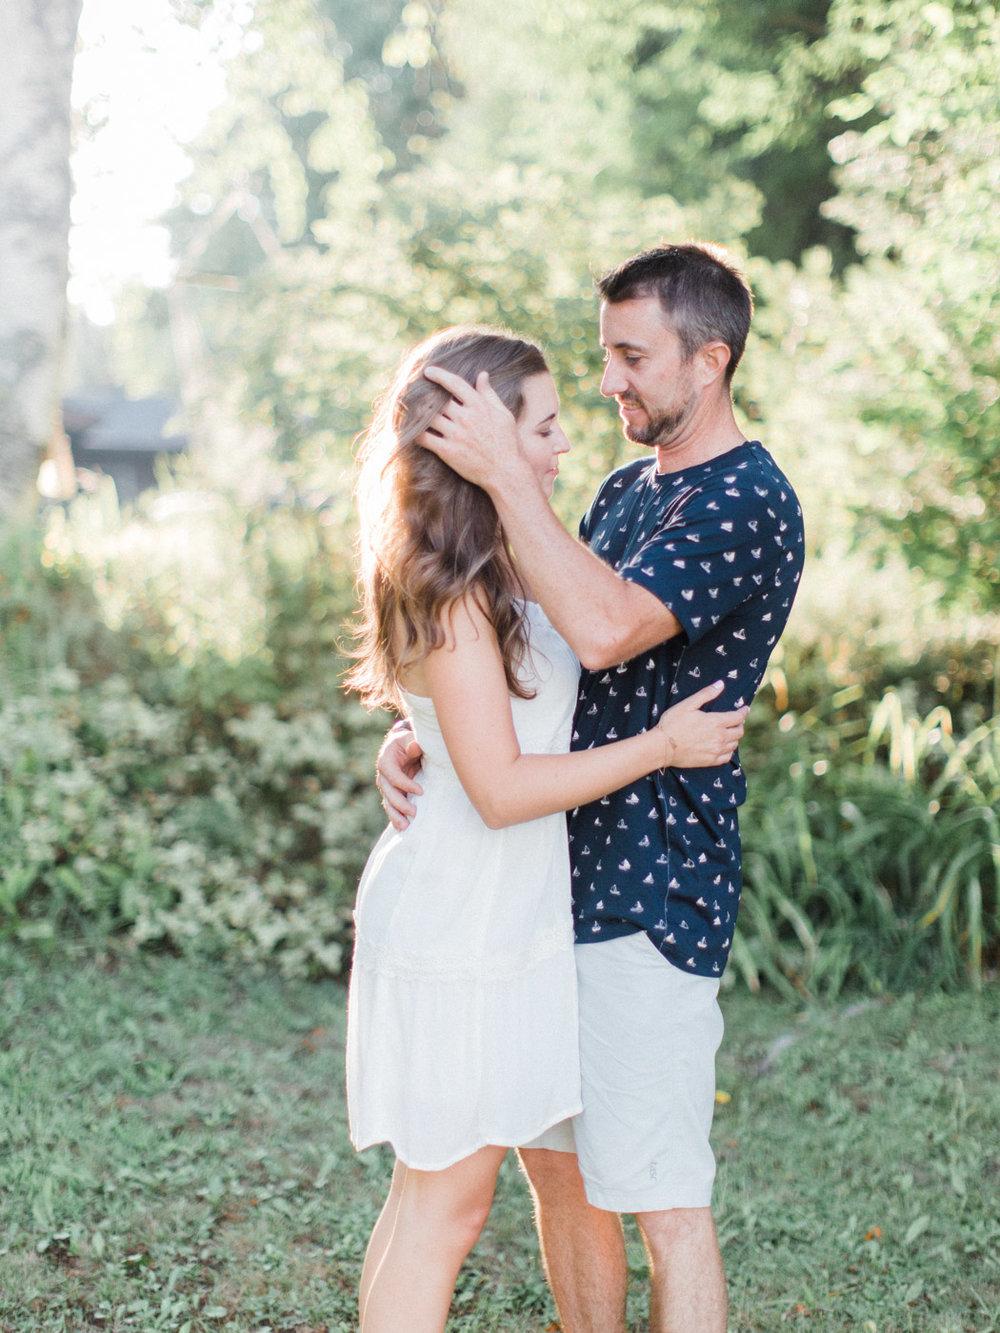 muskoka-wedding-photographer-adventurous-couples-engagement-session-lake-14.jpg